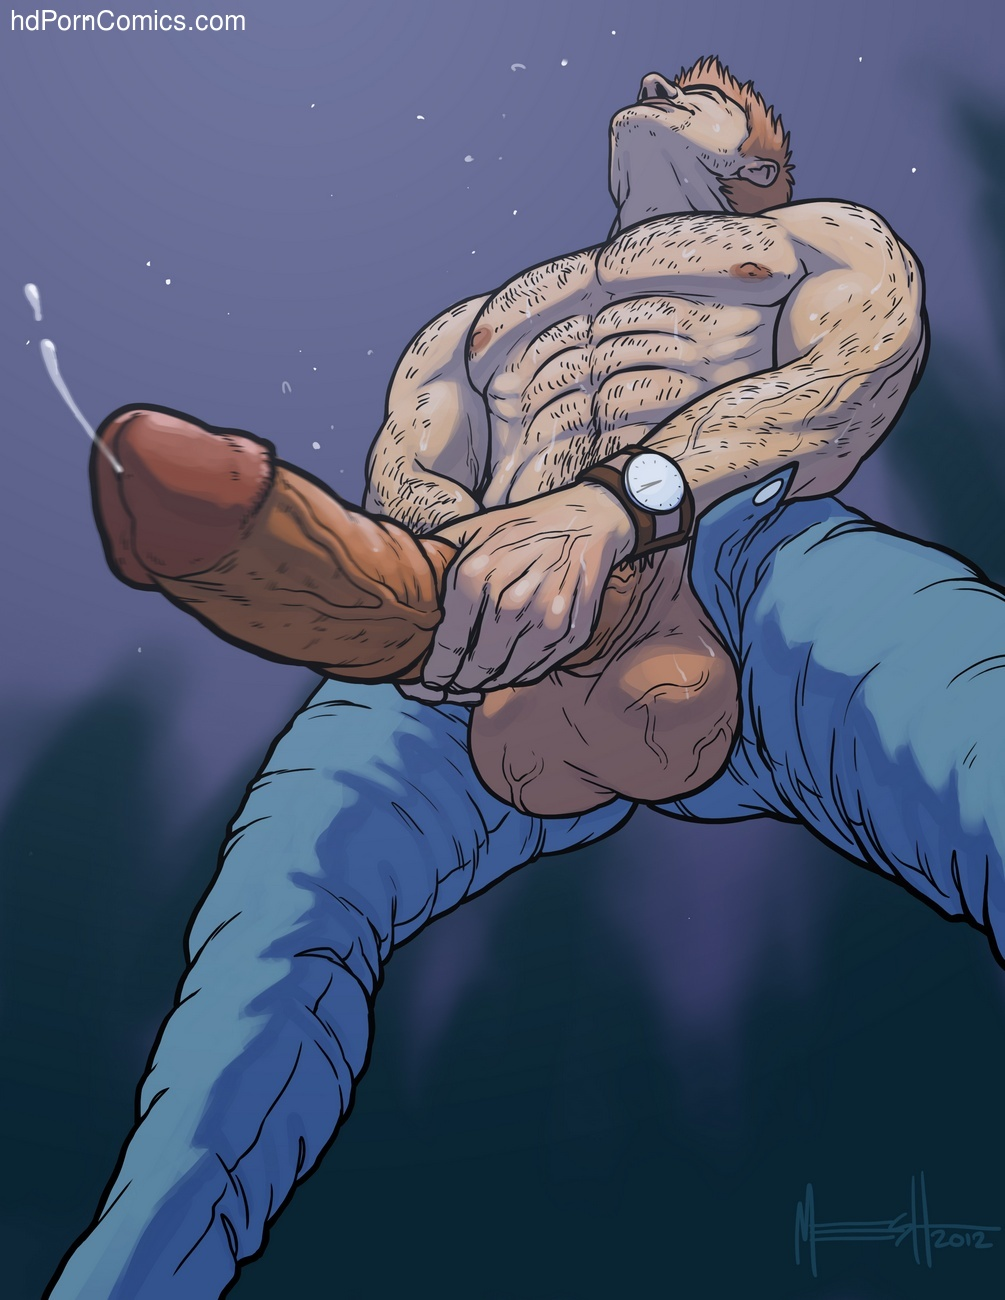 tf porn